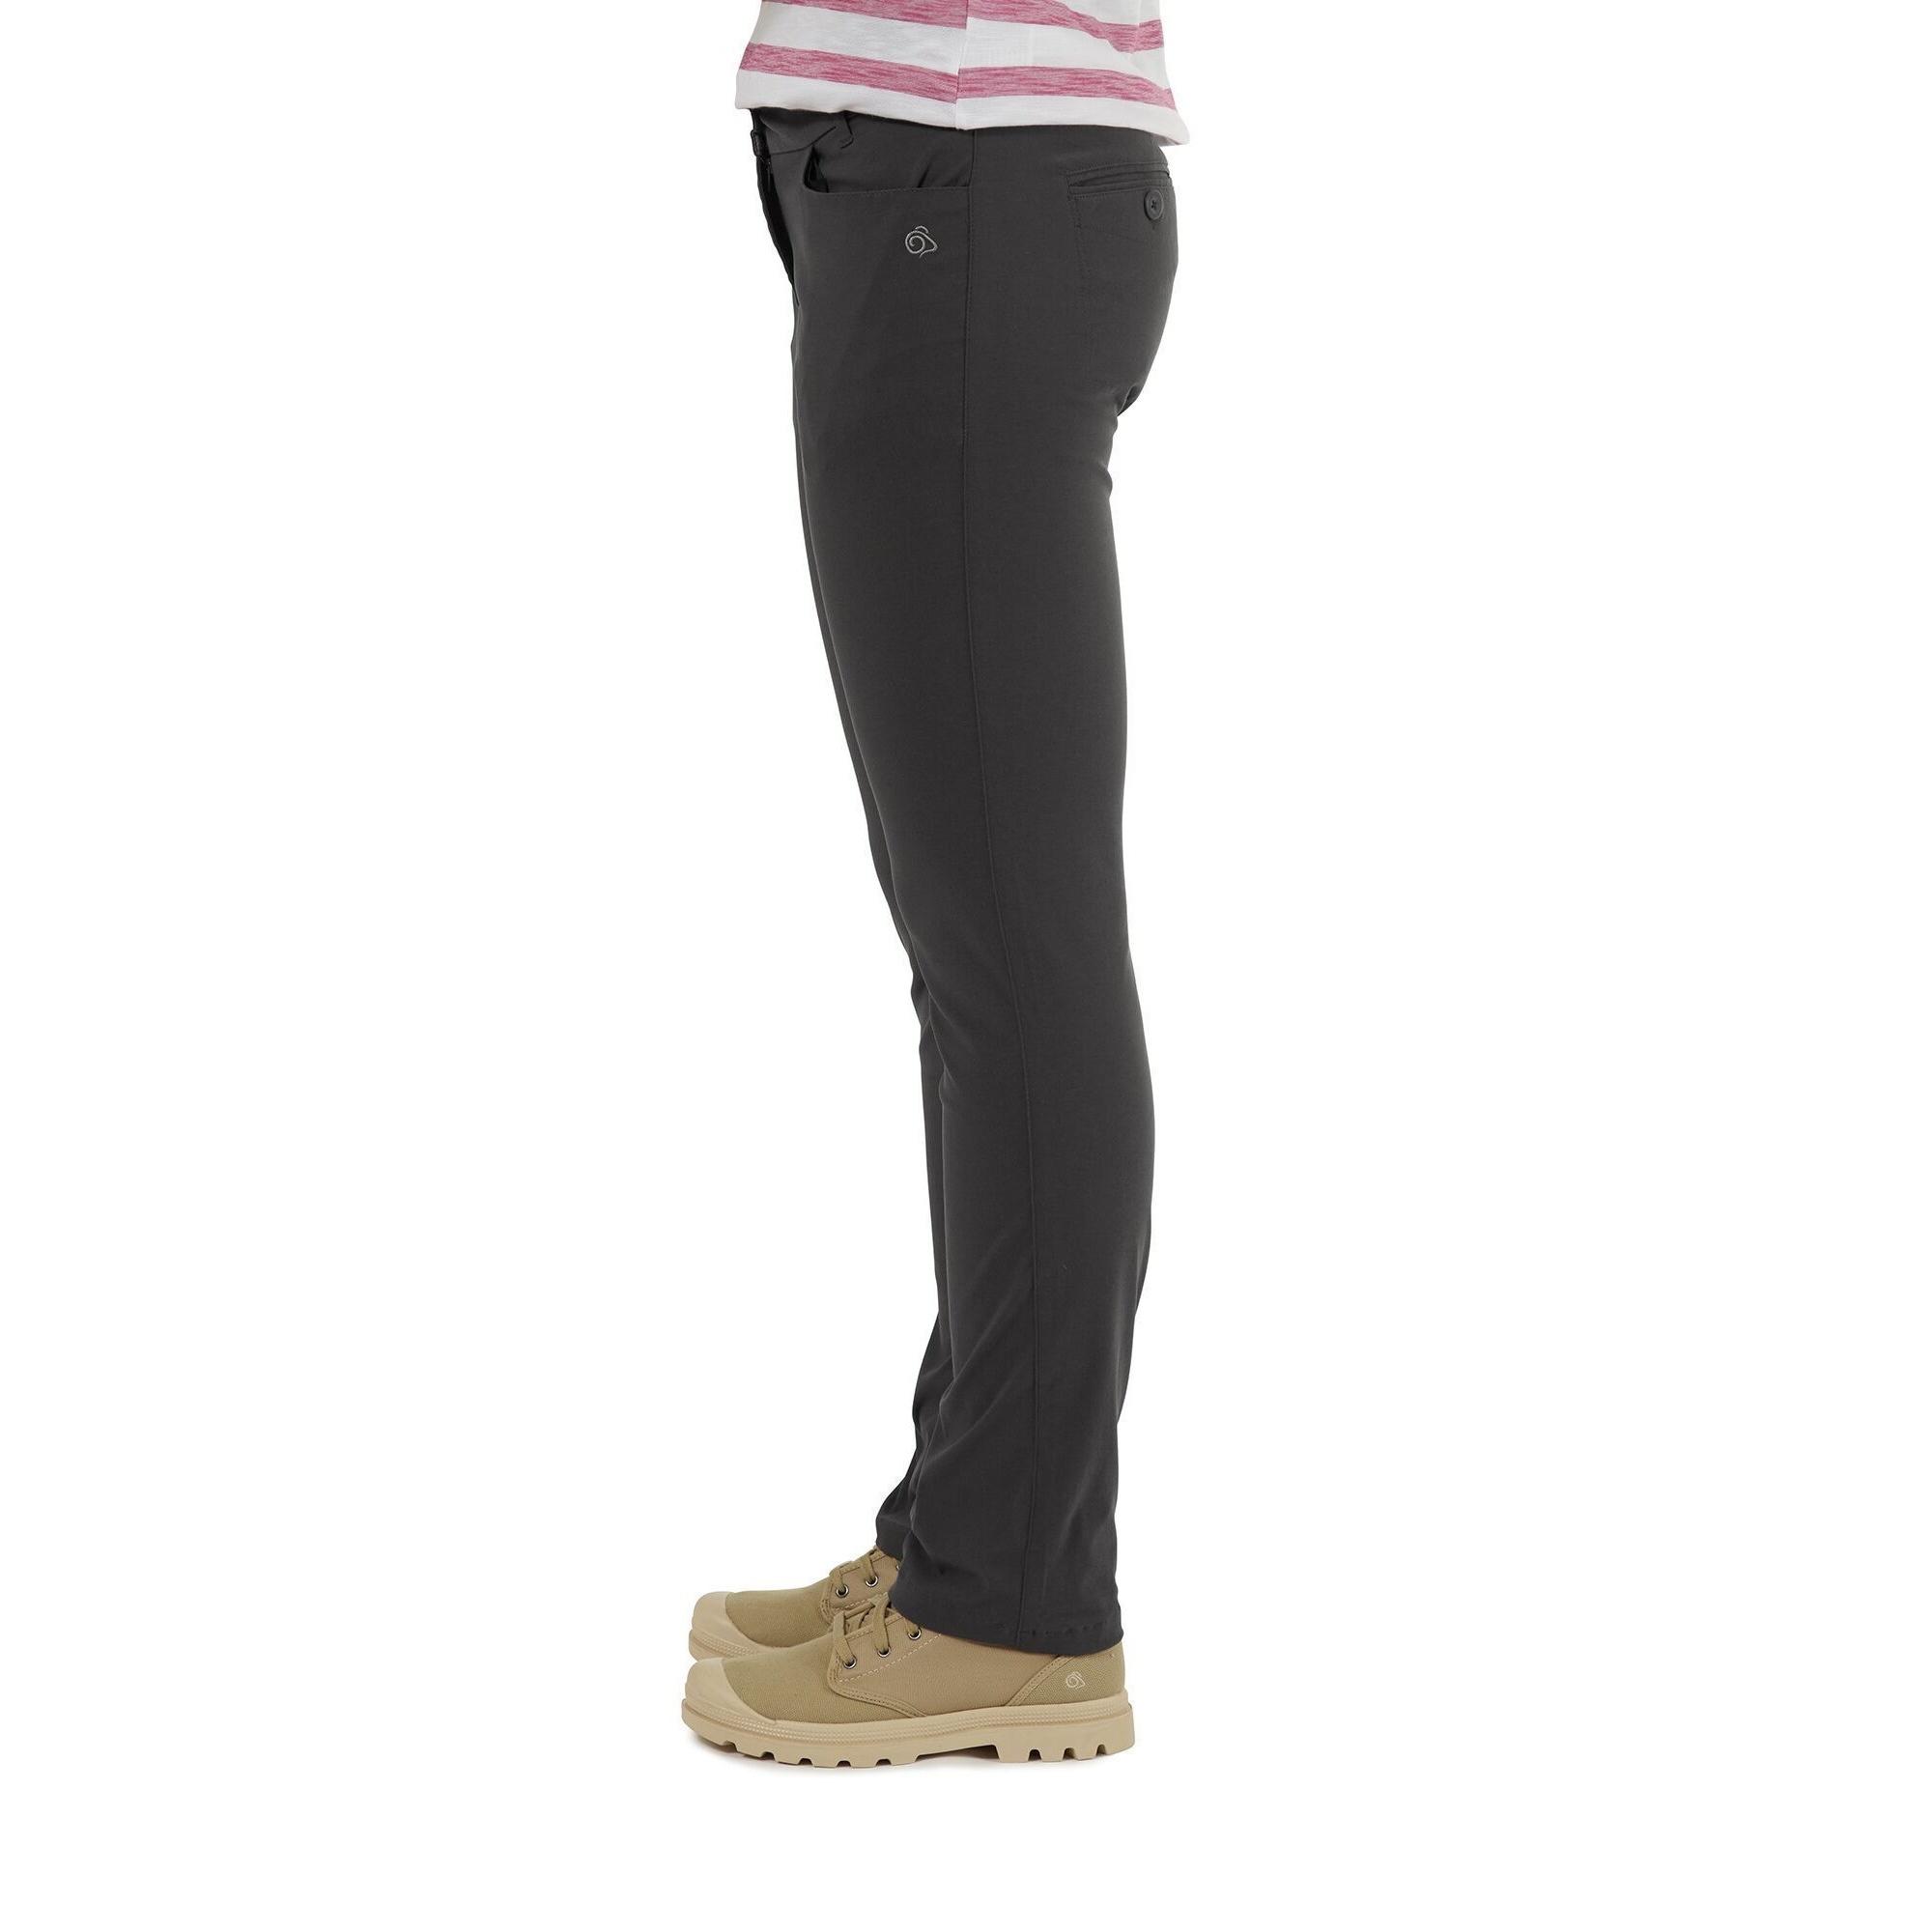 Craghoppers-Pantalon-CLARA-Femme-CG1066 miniature 9